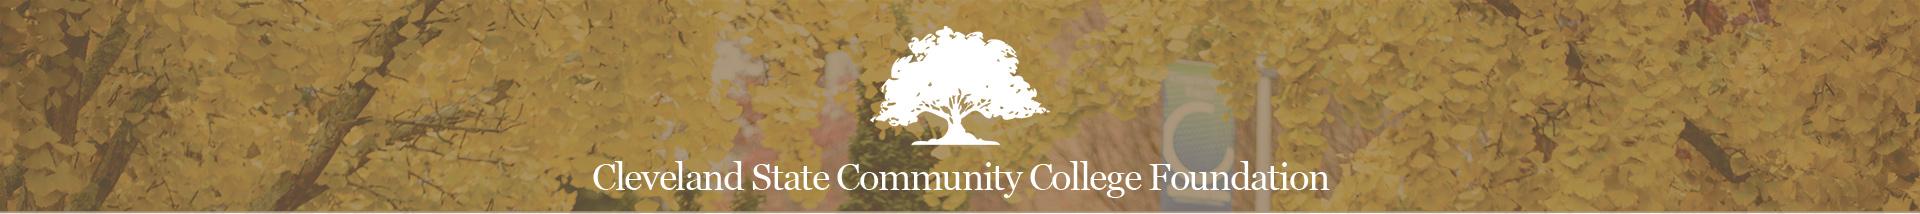 Foundation Logo with Tree